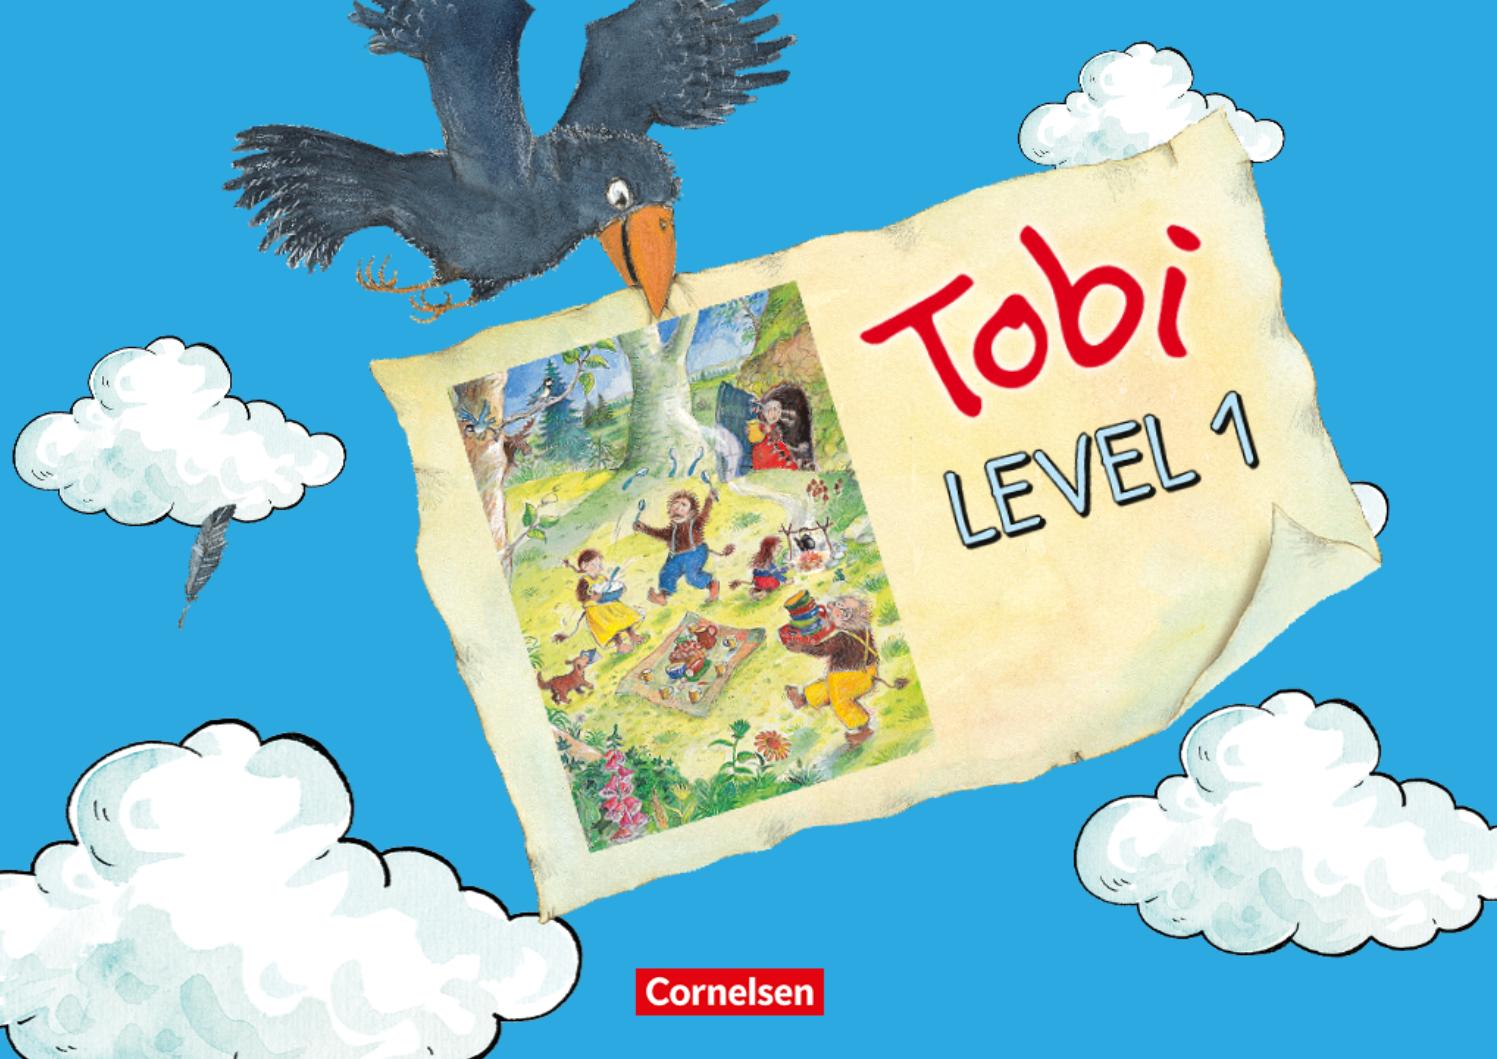 Tobi WebApp Lernspiel